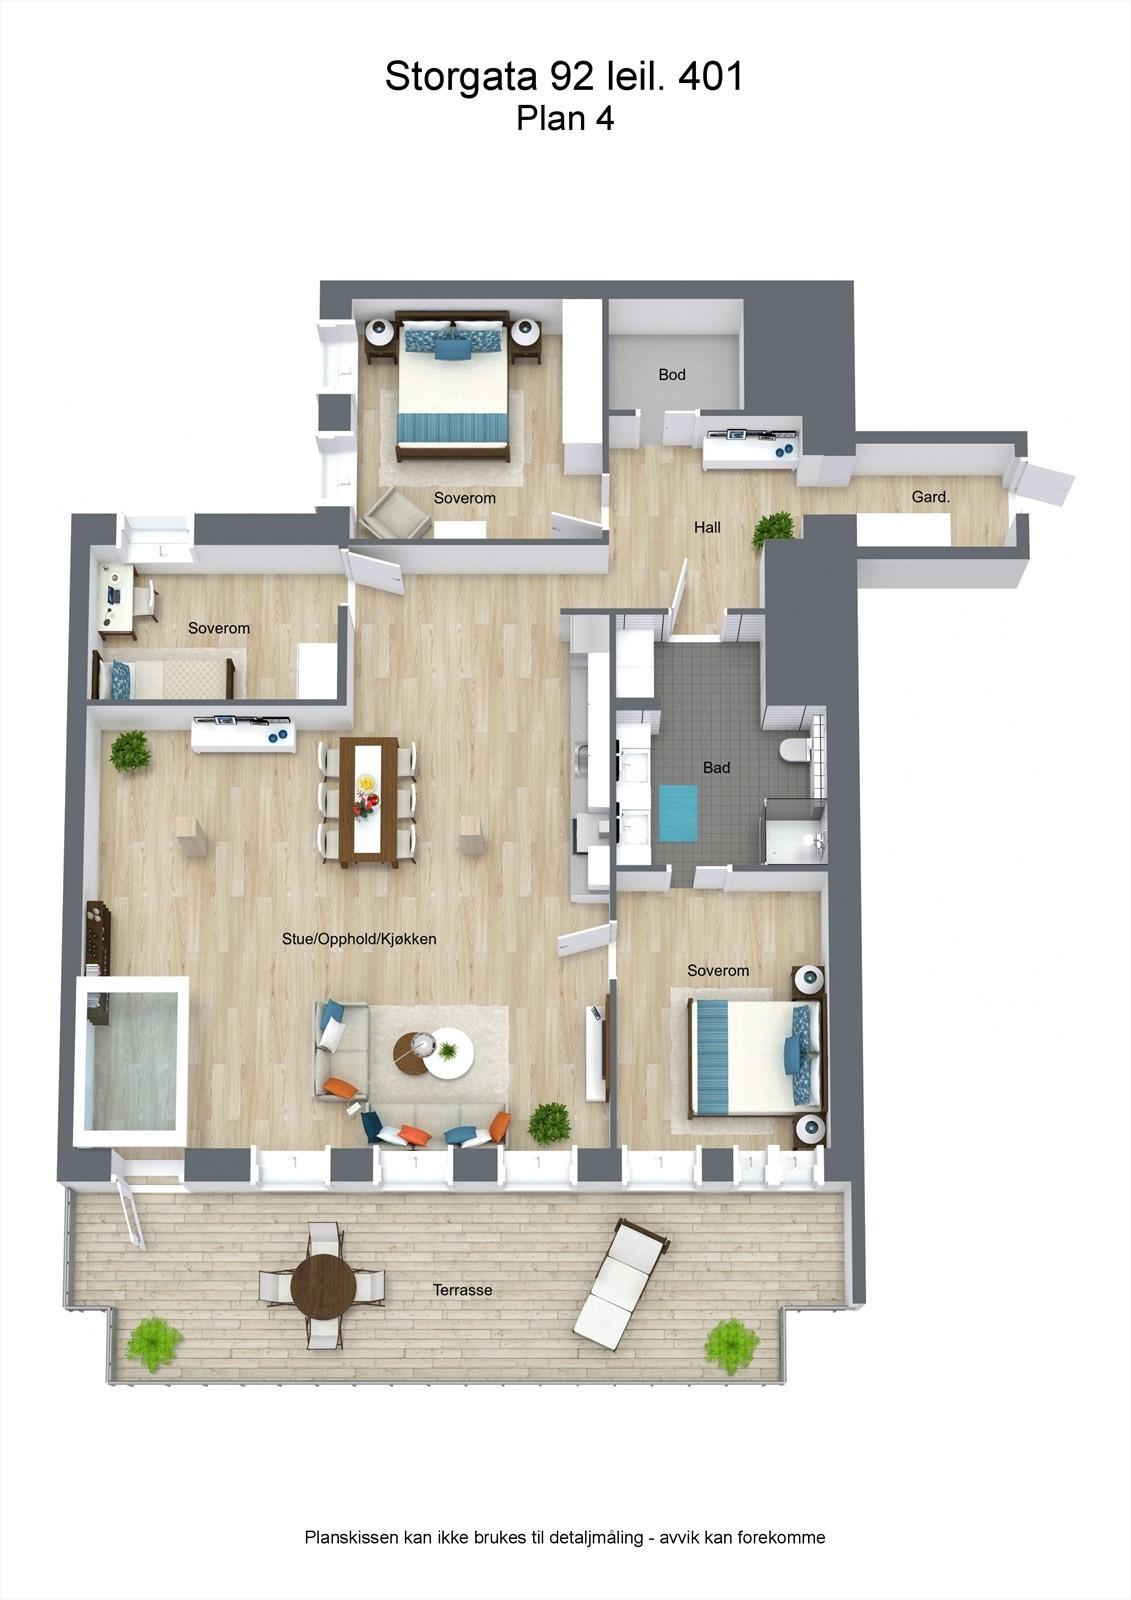 Floorplan letterhead - Storgata 92 leil. 401 - Plan 4 - 3D Floor Plan.jpg